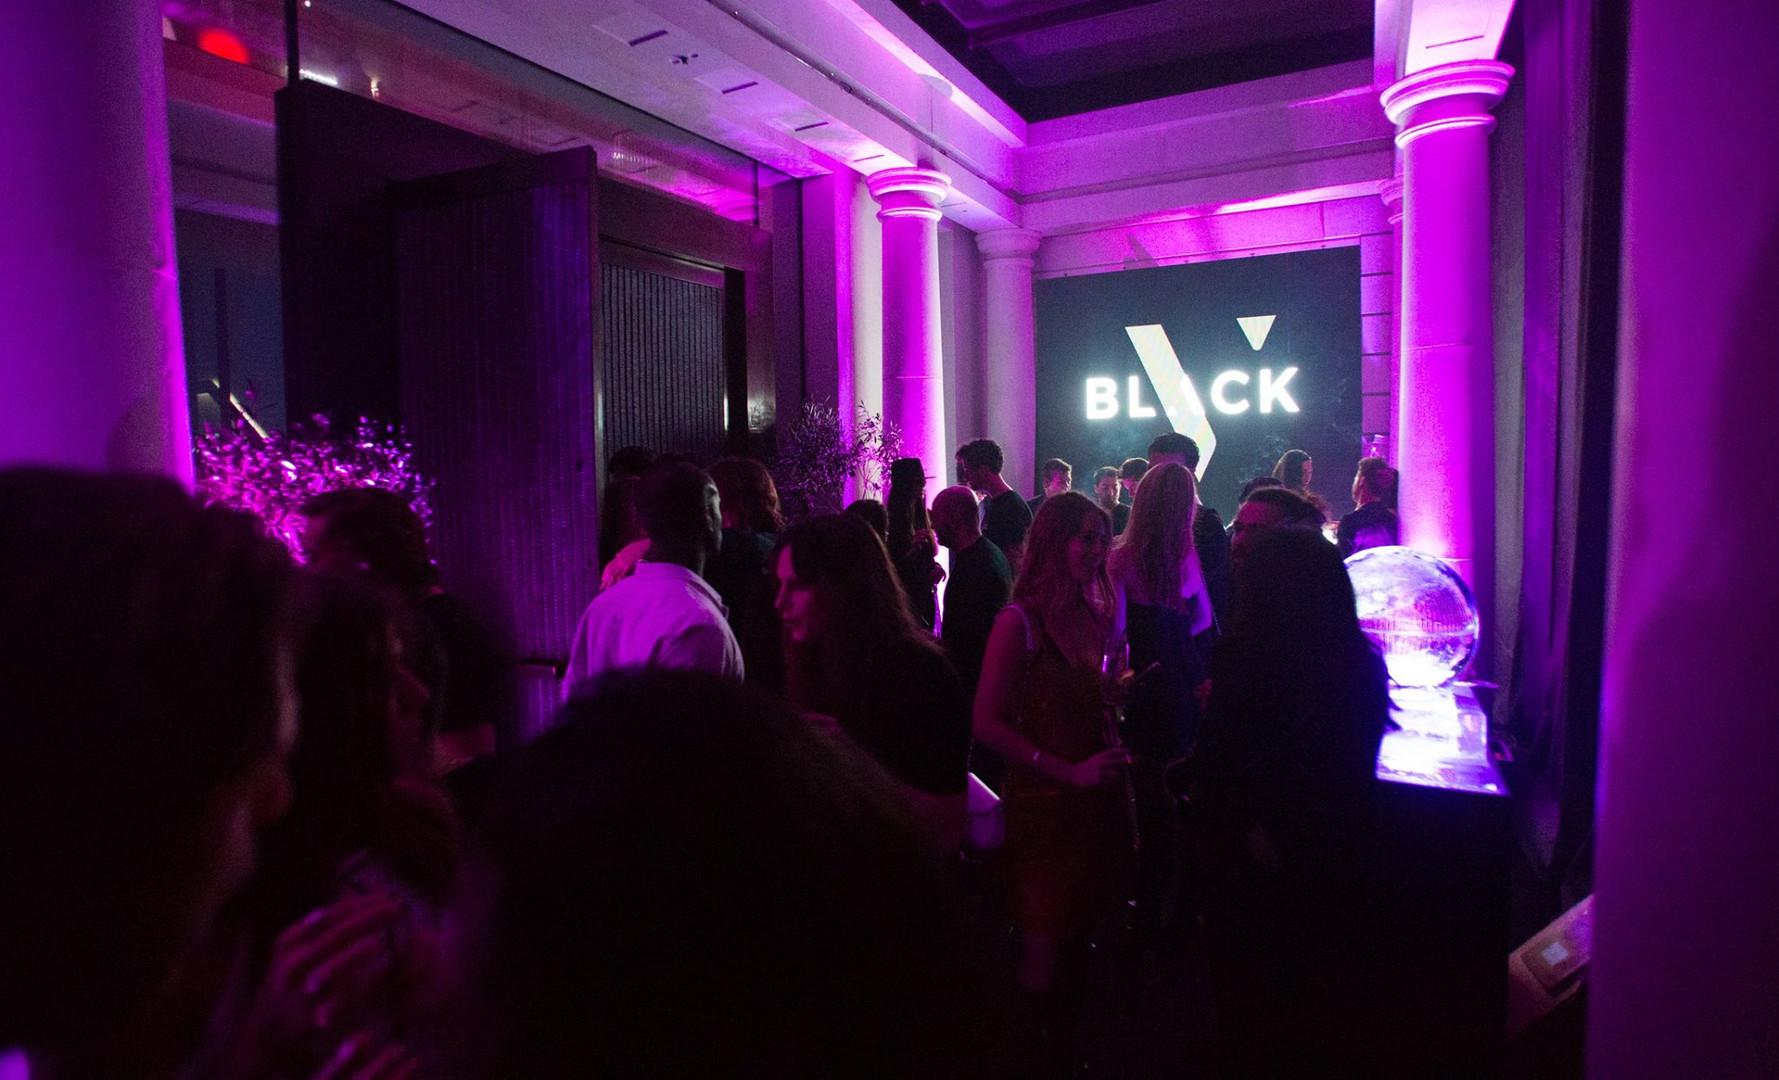 Velocity Black London Fashion Week Closing Party